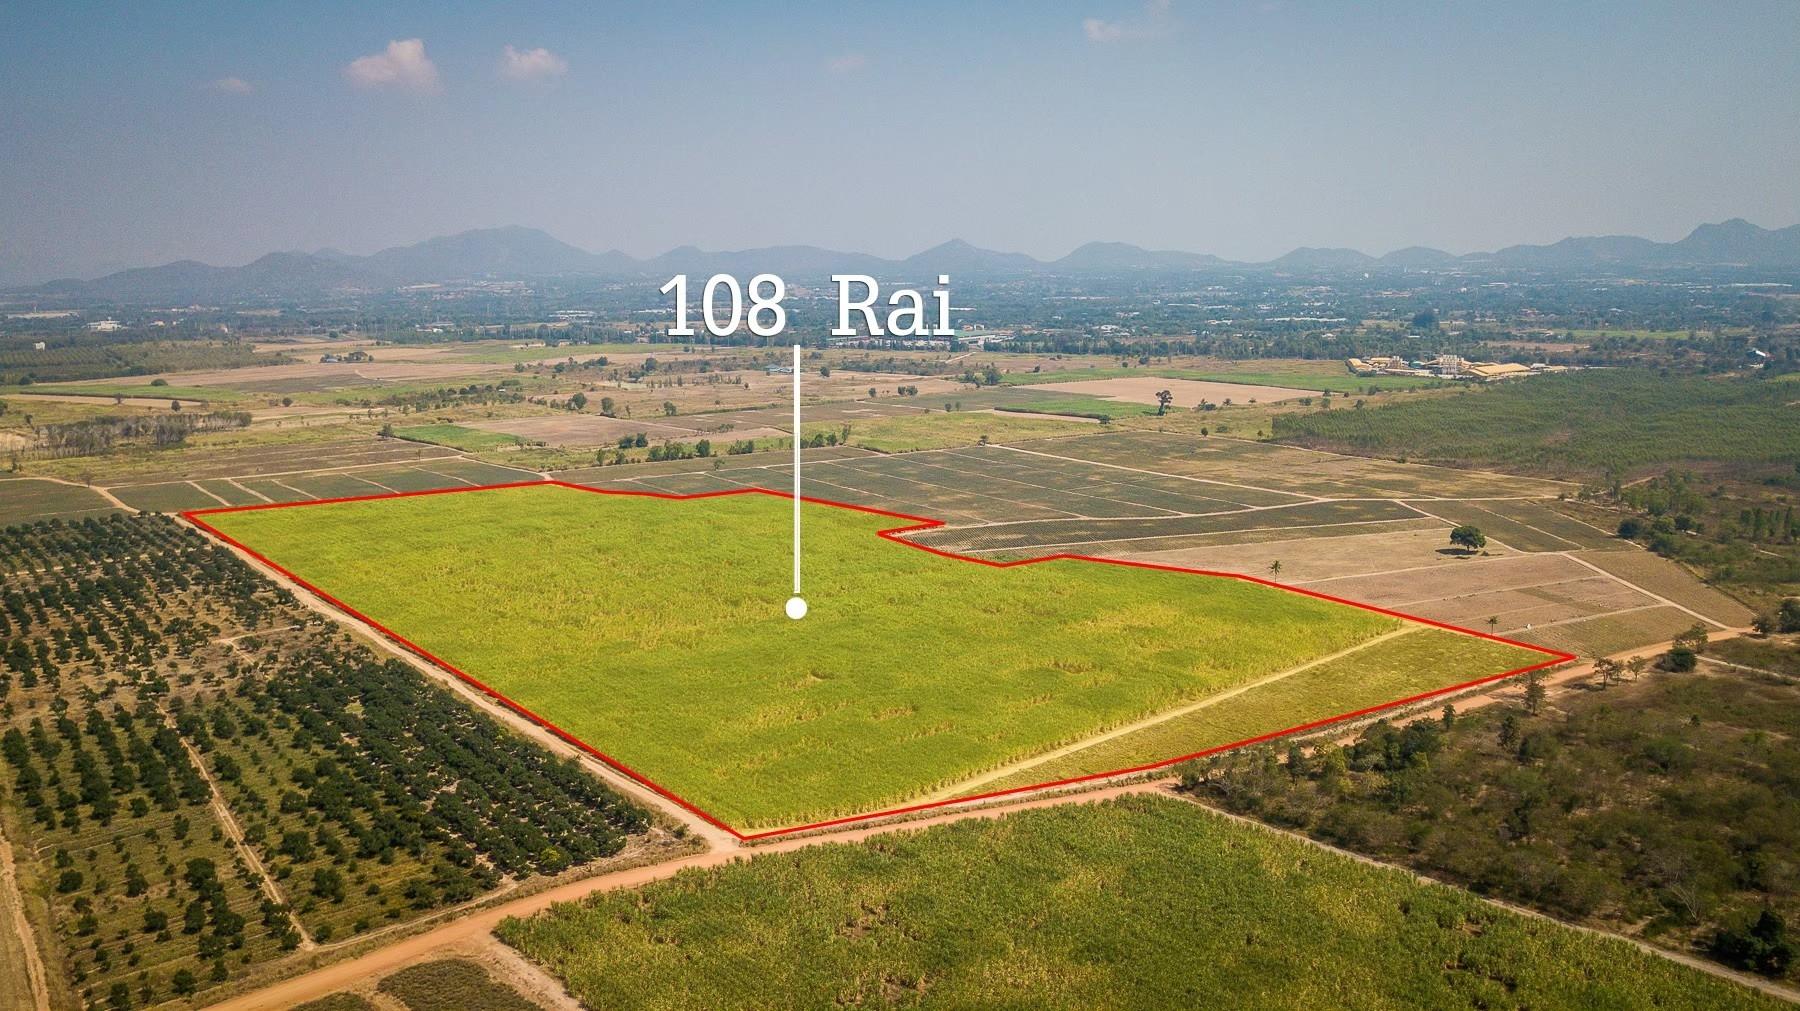 108 Rai of Land for Sale